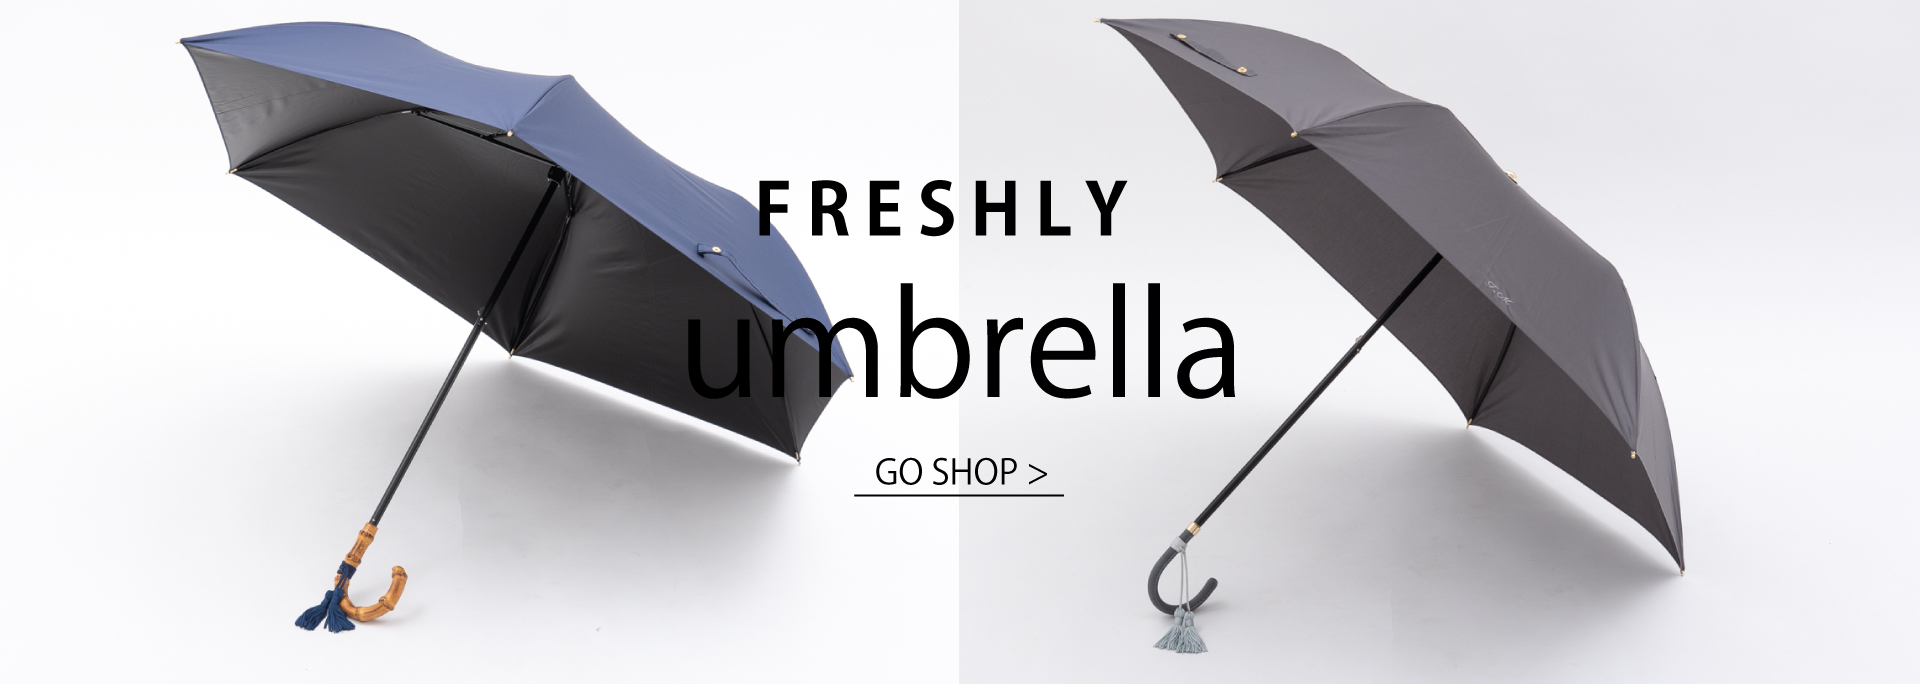 FRESHLY umbrella オリジナル晴雨兼用傘